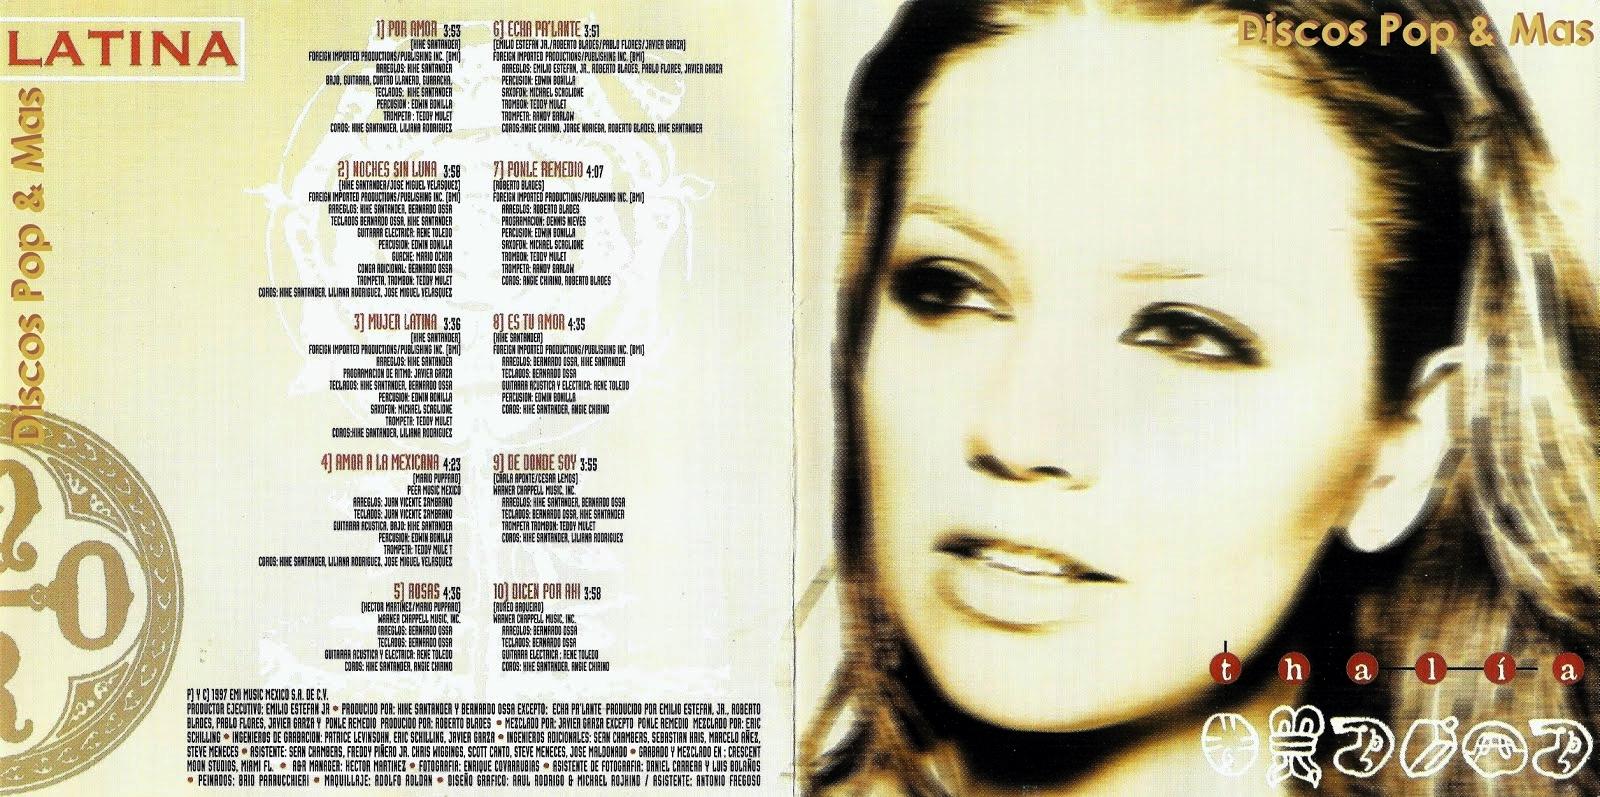 remedios latin singles Singles time spa unipersonale 01-01-2010 let it go 01 let it go remedios (latin extended mix) dj brizi remedios 05:13 03 remedios (ziko radio club.